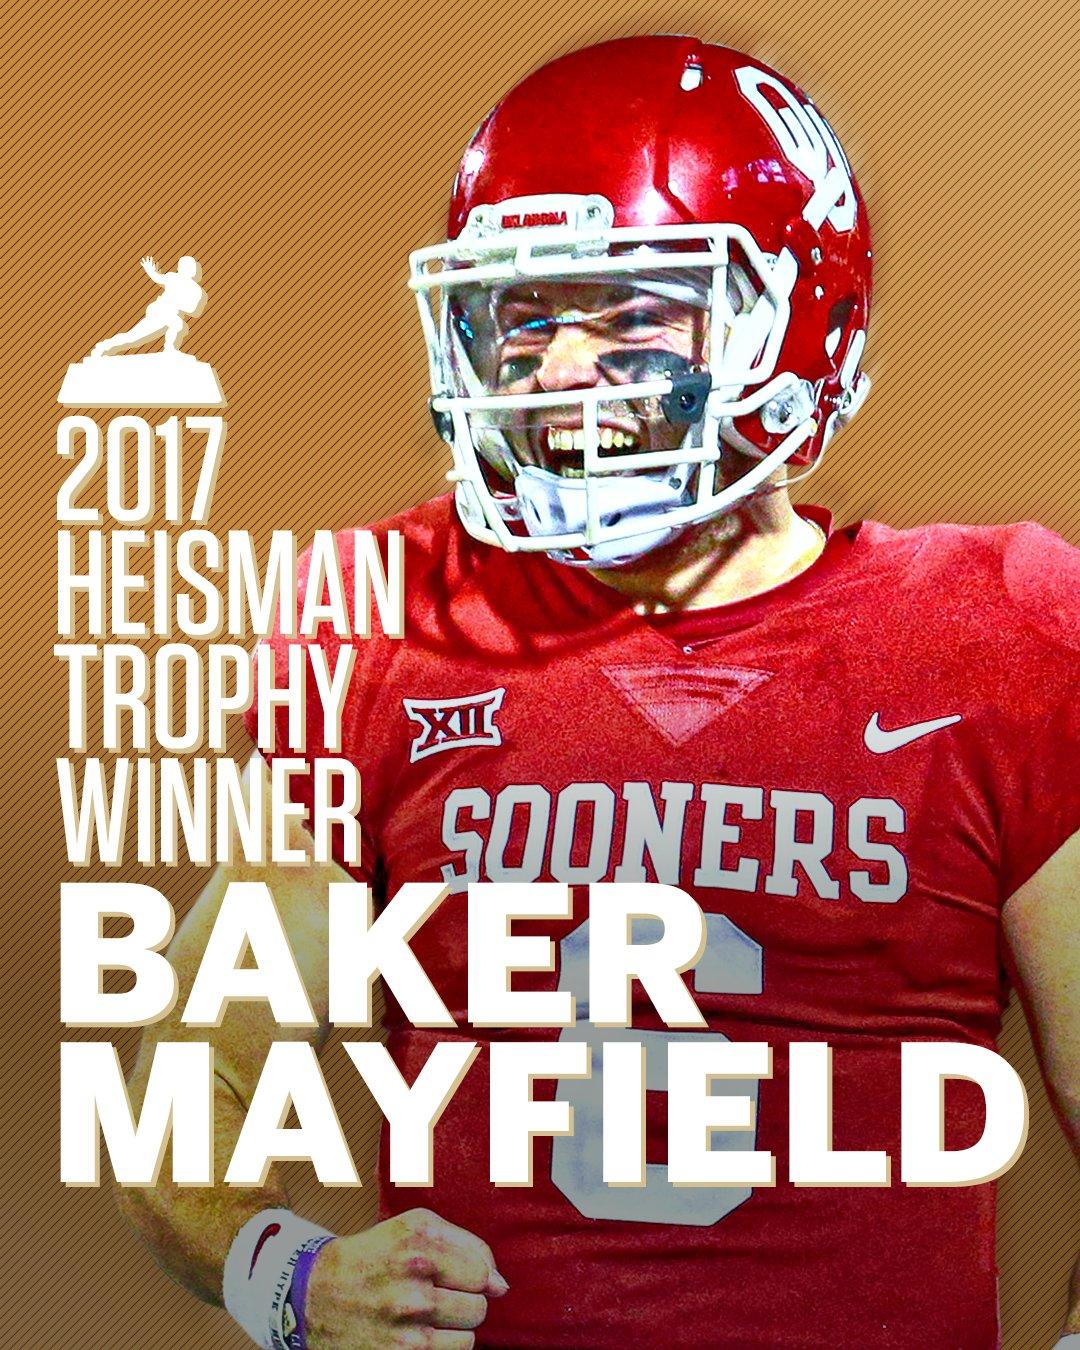 Baker Mayfield's legend is cemented.  The 2017 Heisman Trophy is his! https://t.co/YsBt1XsBrp